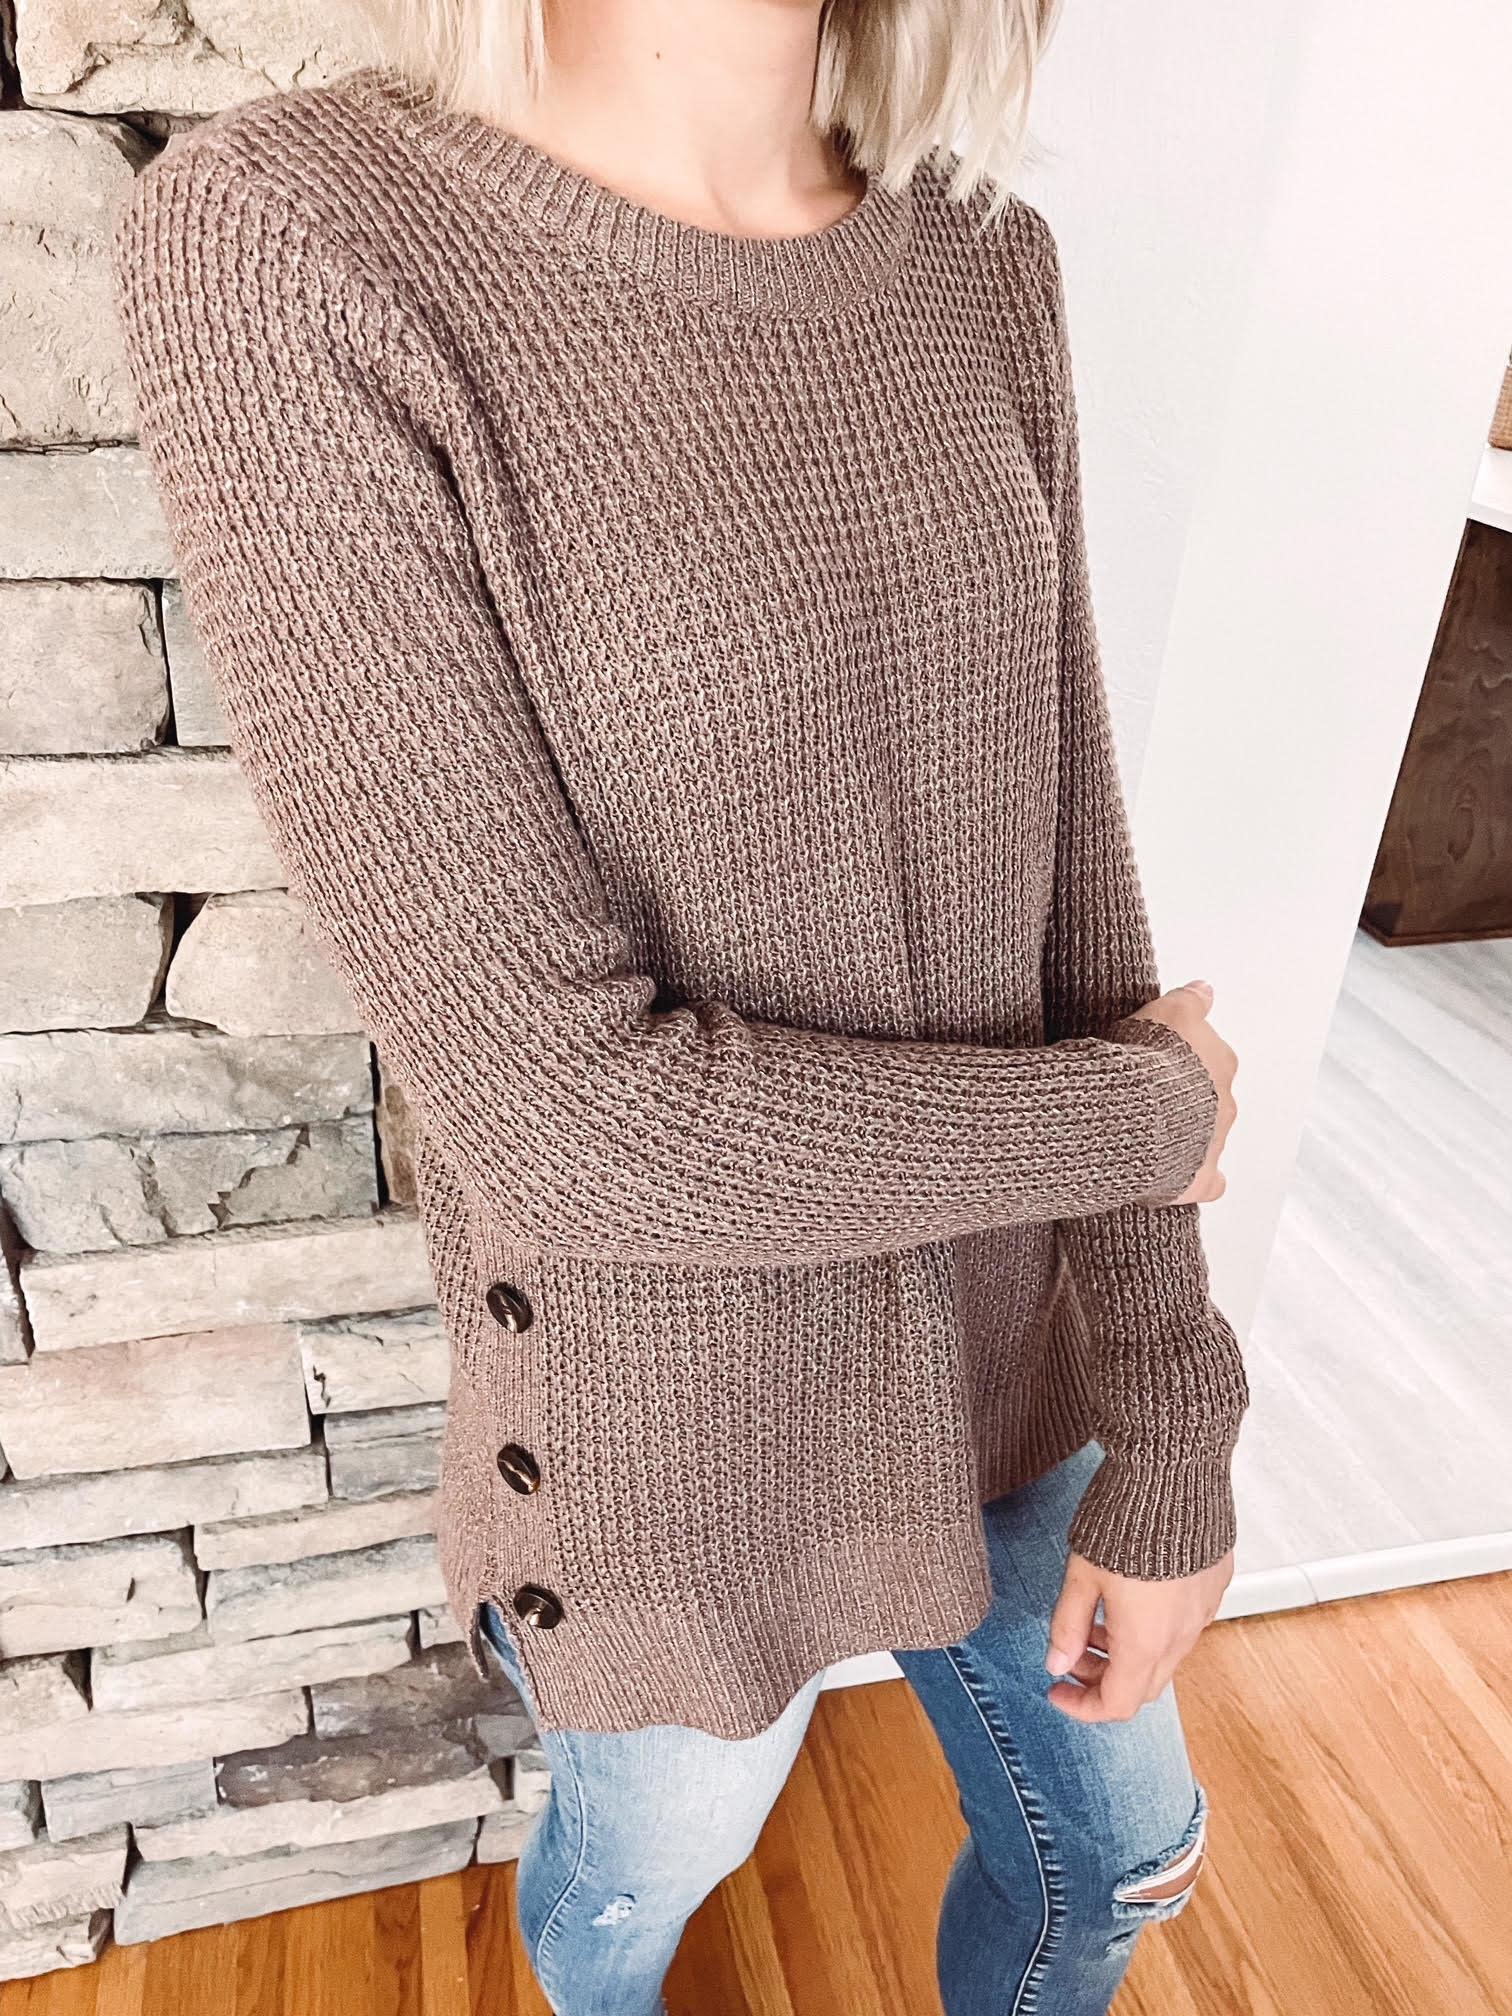 Maddie Cappuccino Sweater